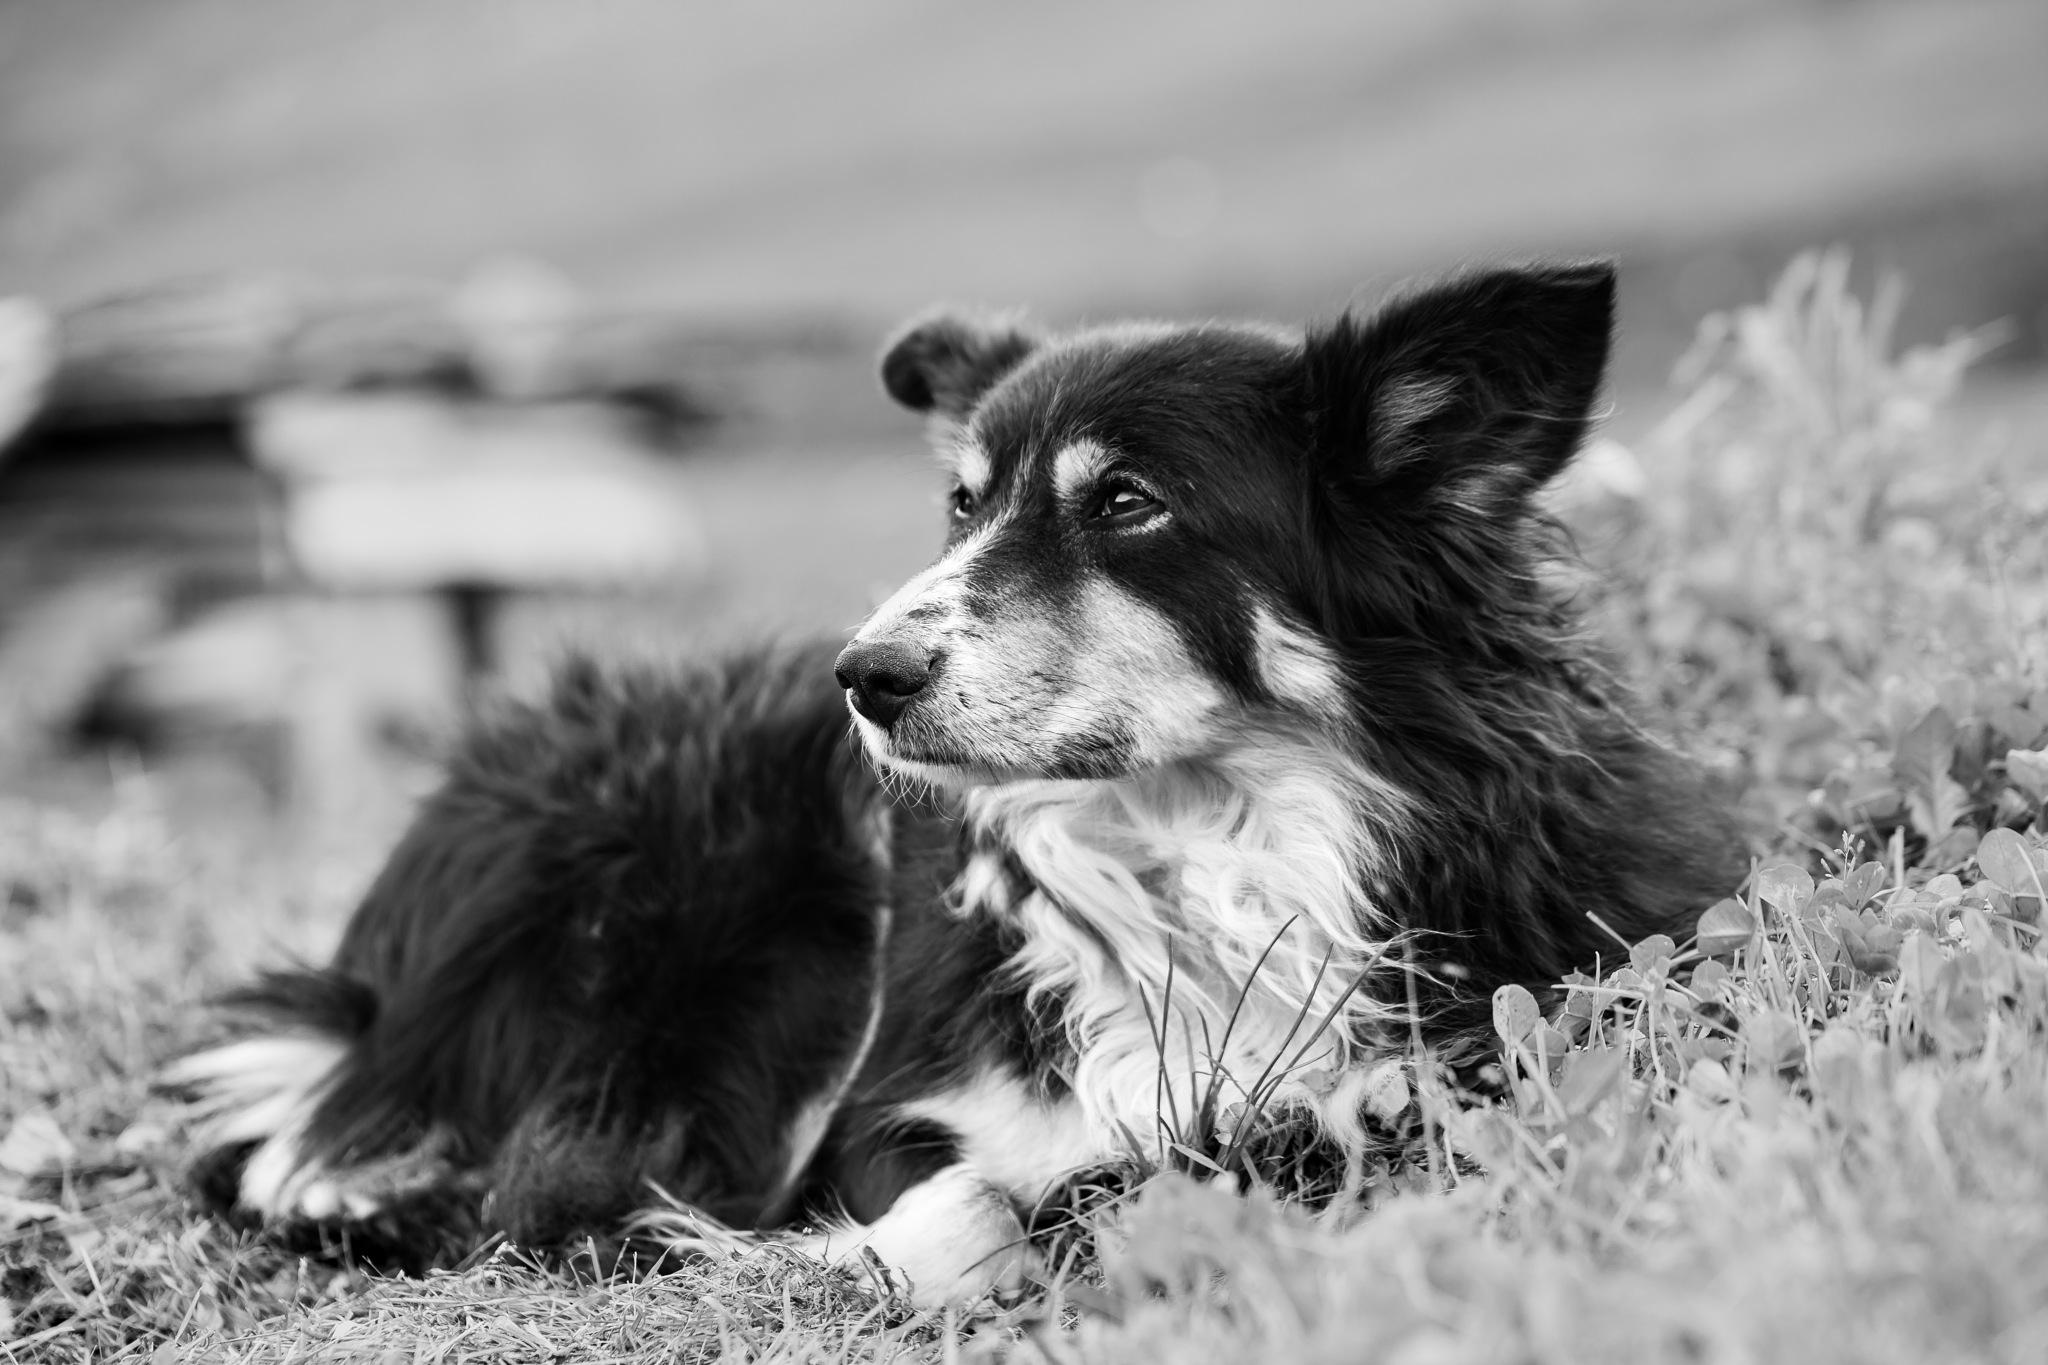 Taîs, the shepherd dog by Samuel Pettina